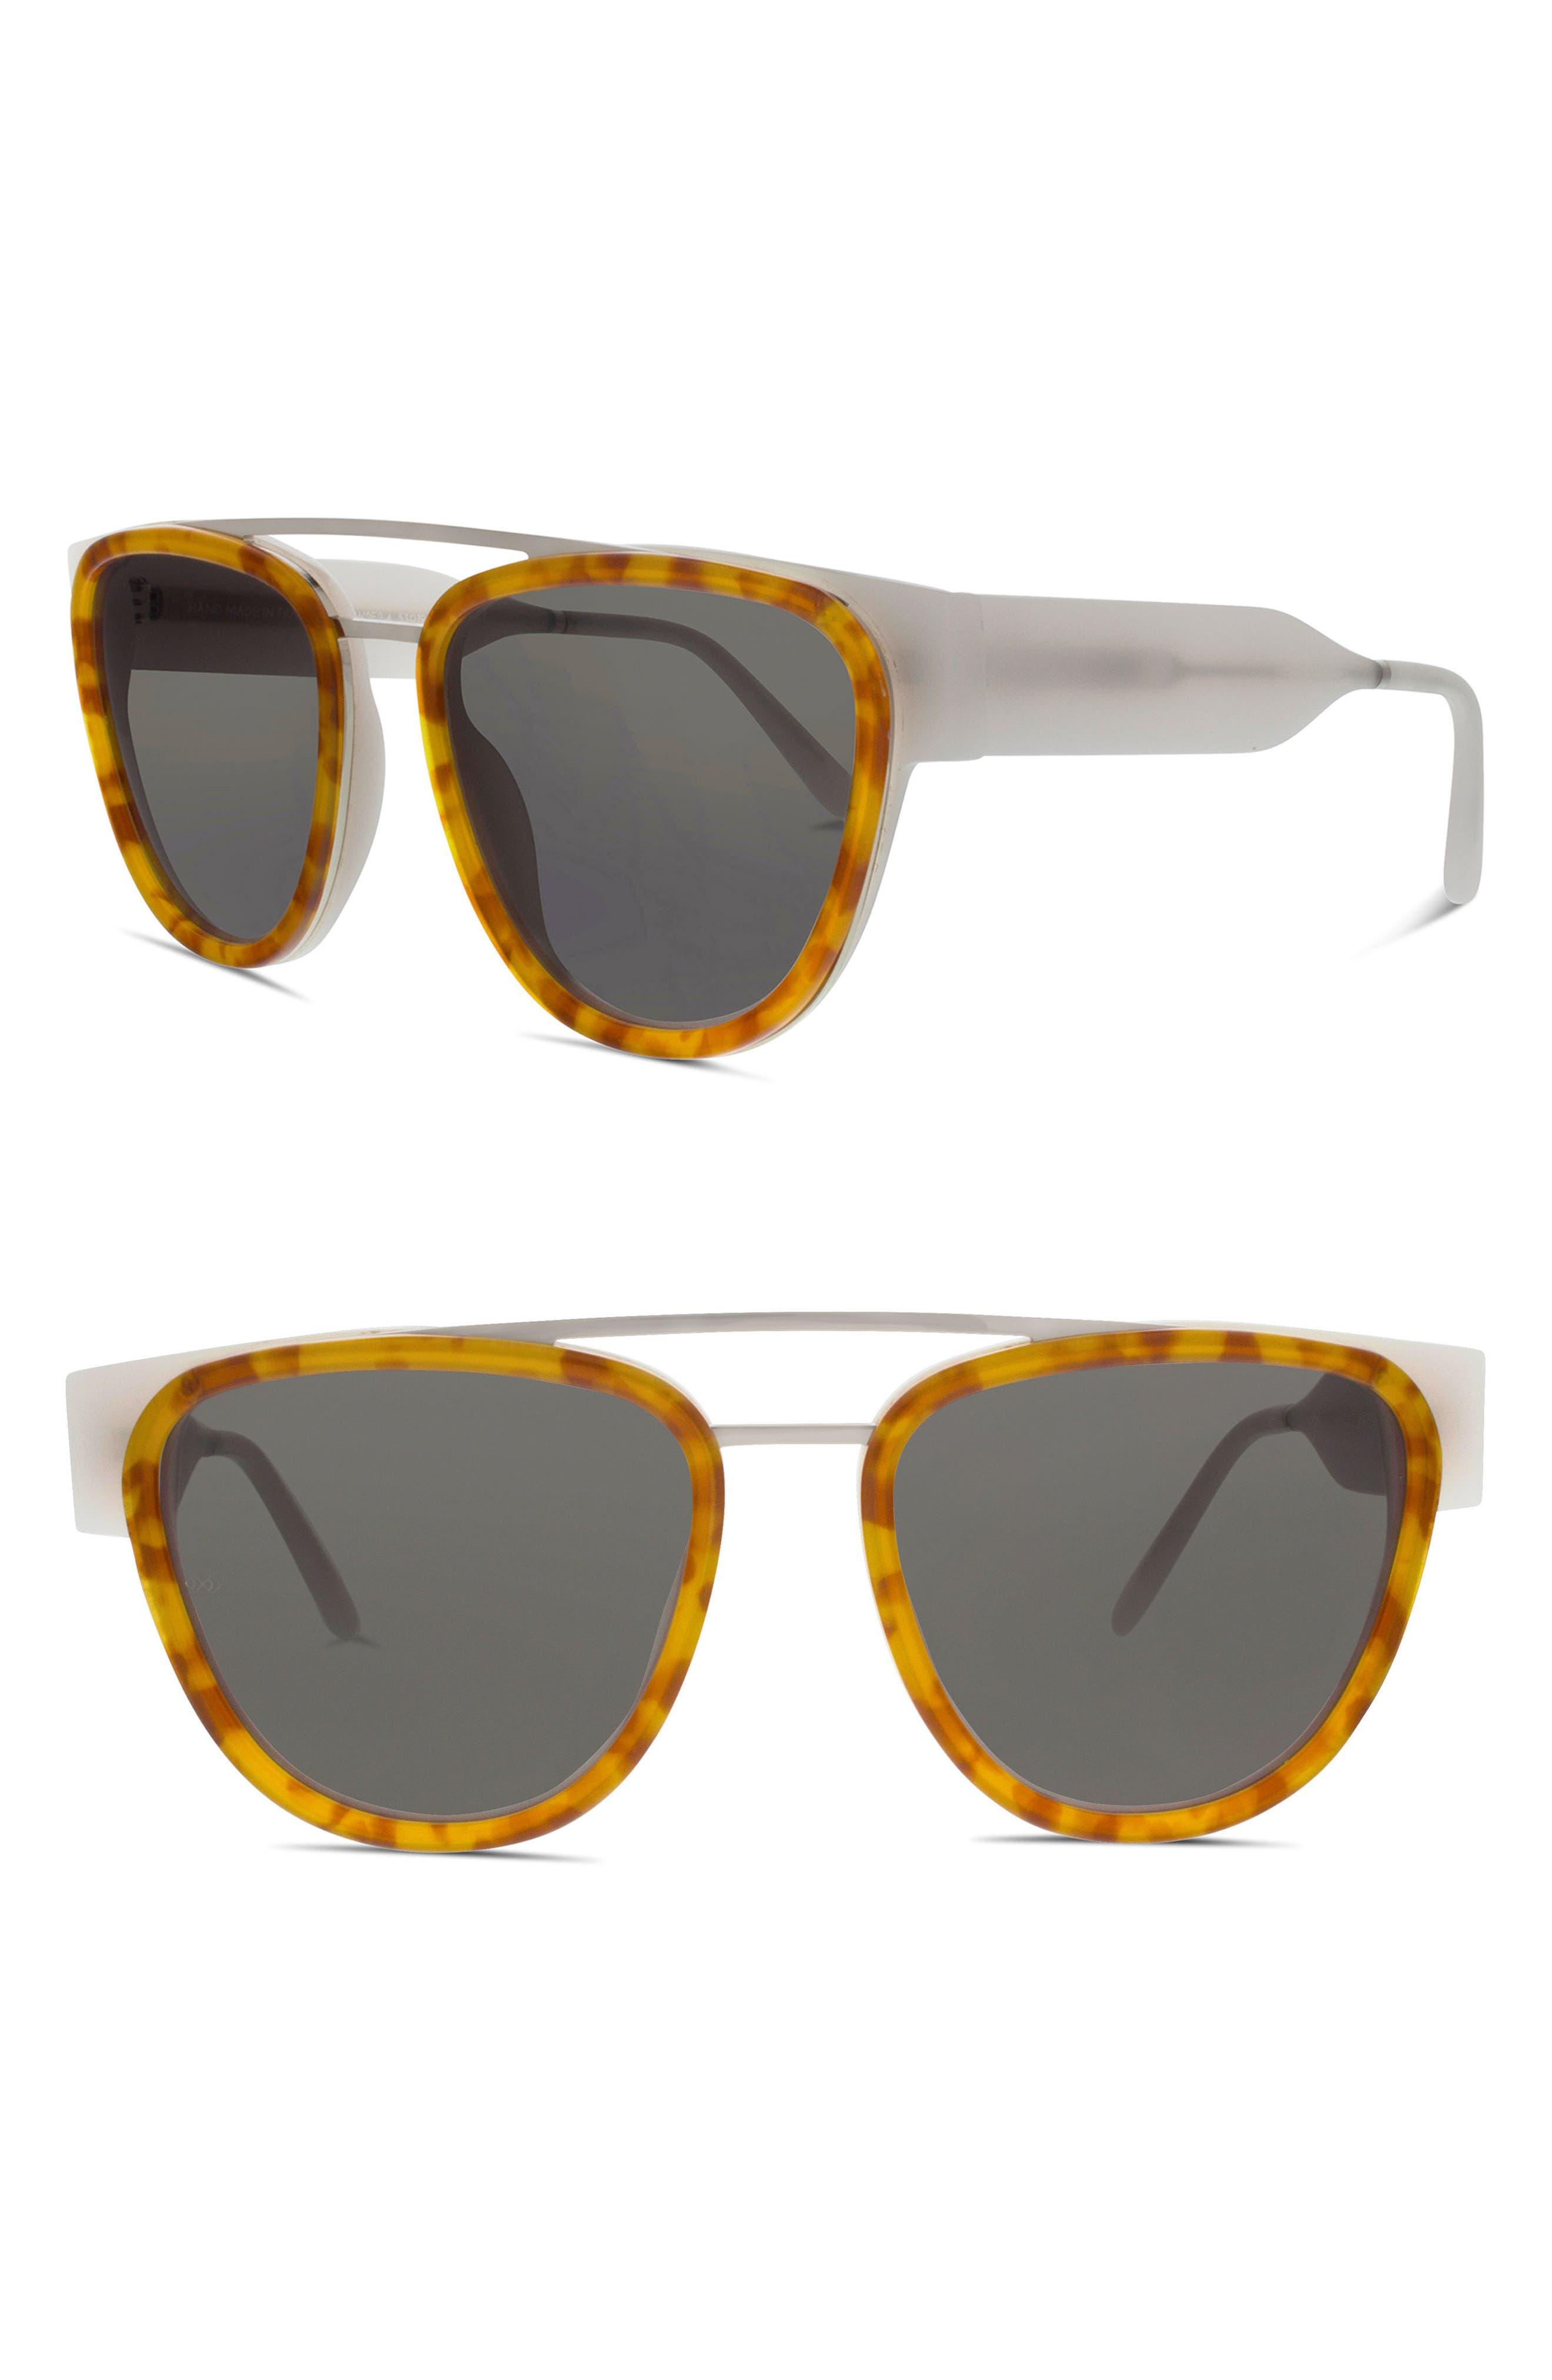 Soda Pop II 53mm Square Sunglasses,                         Main,                         color, Ivory/ Ginger Tortoise/ Silver